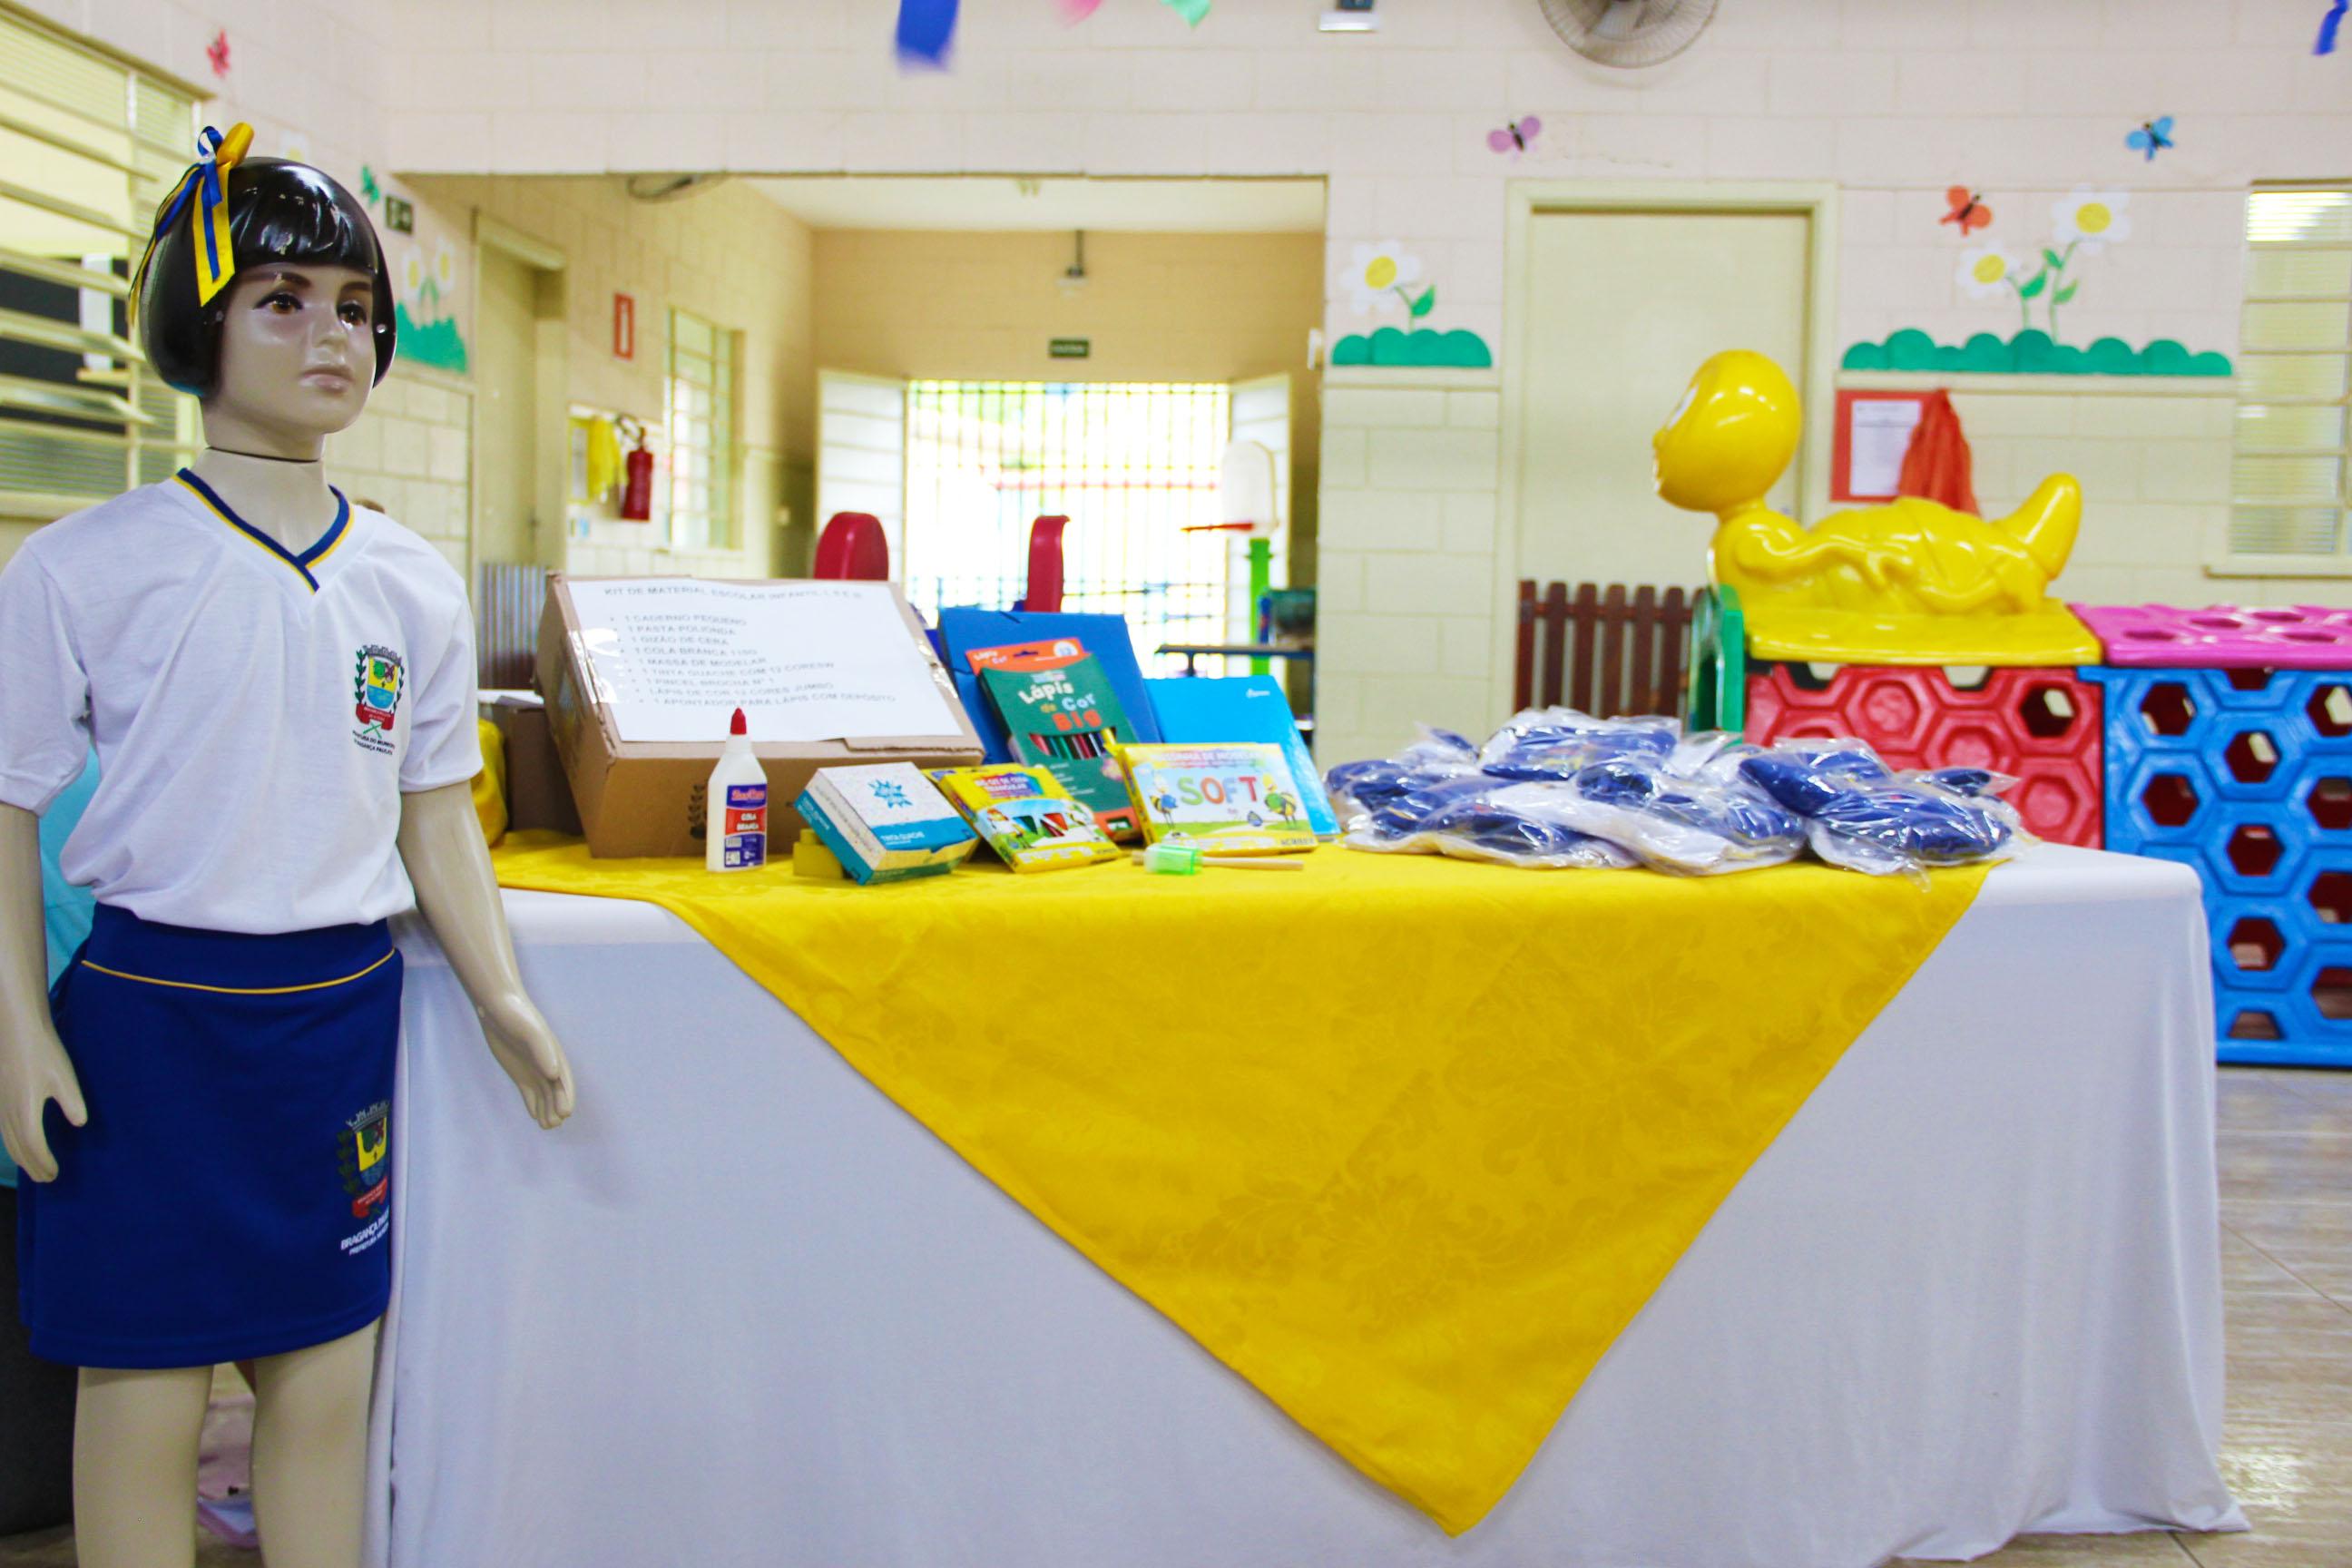 03.02.2020 Entrega de Kit Escolar e uniformes Escola Antonio José da Fonseca (1)